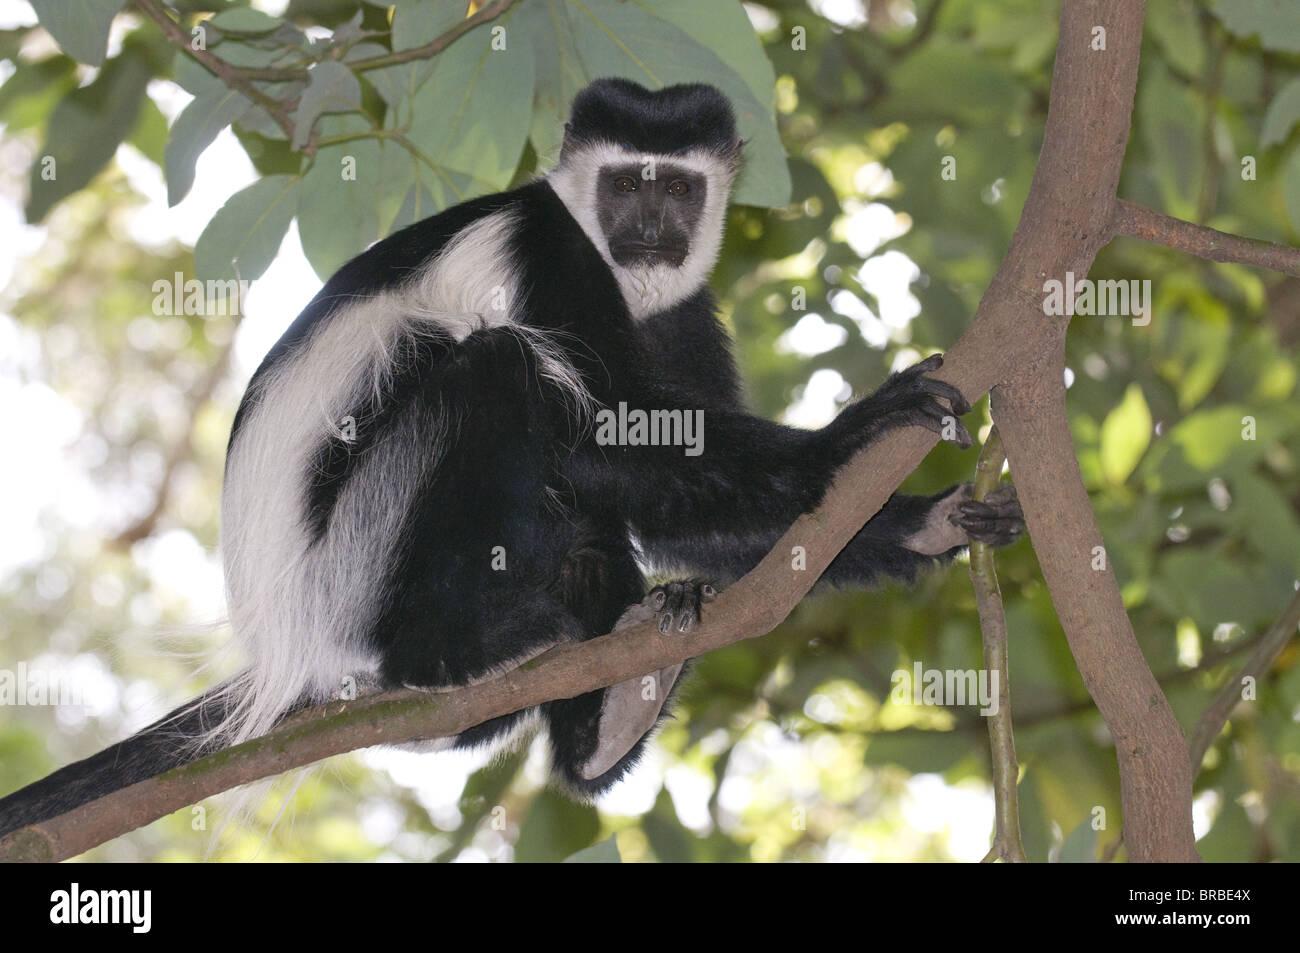 Black and White Colobus Monkey (Colobus satanas), Etiopia Immagini Stock